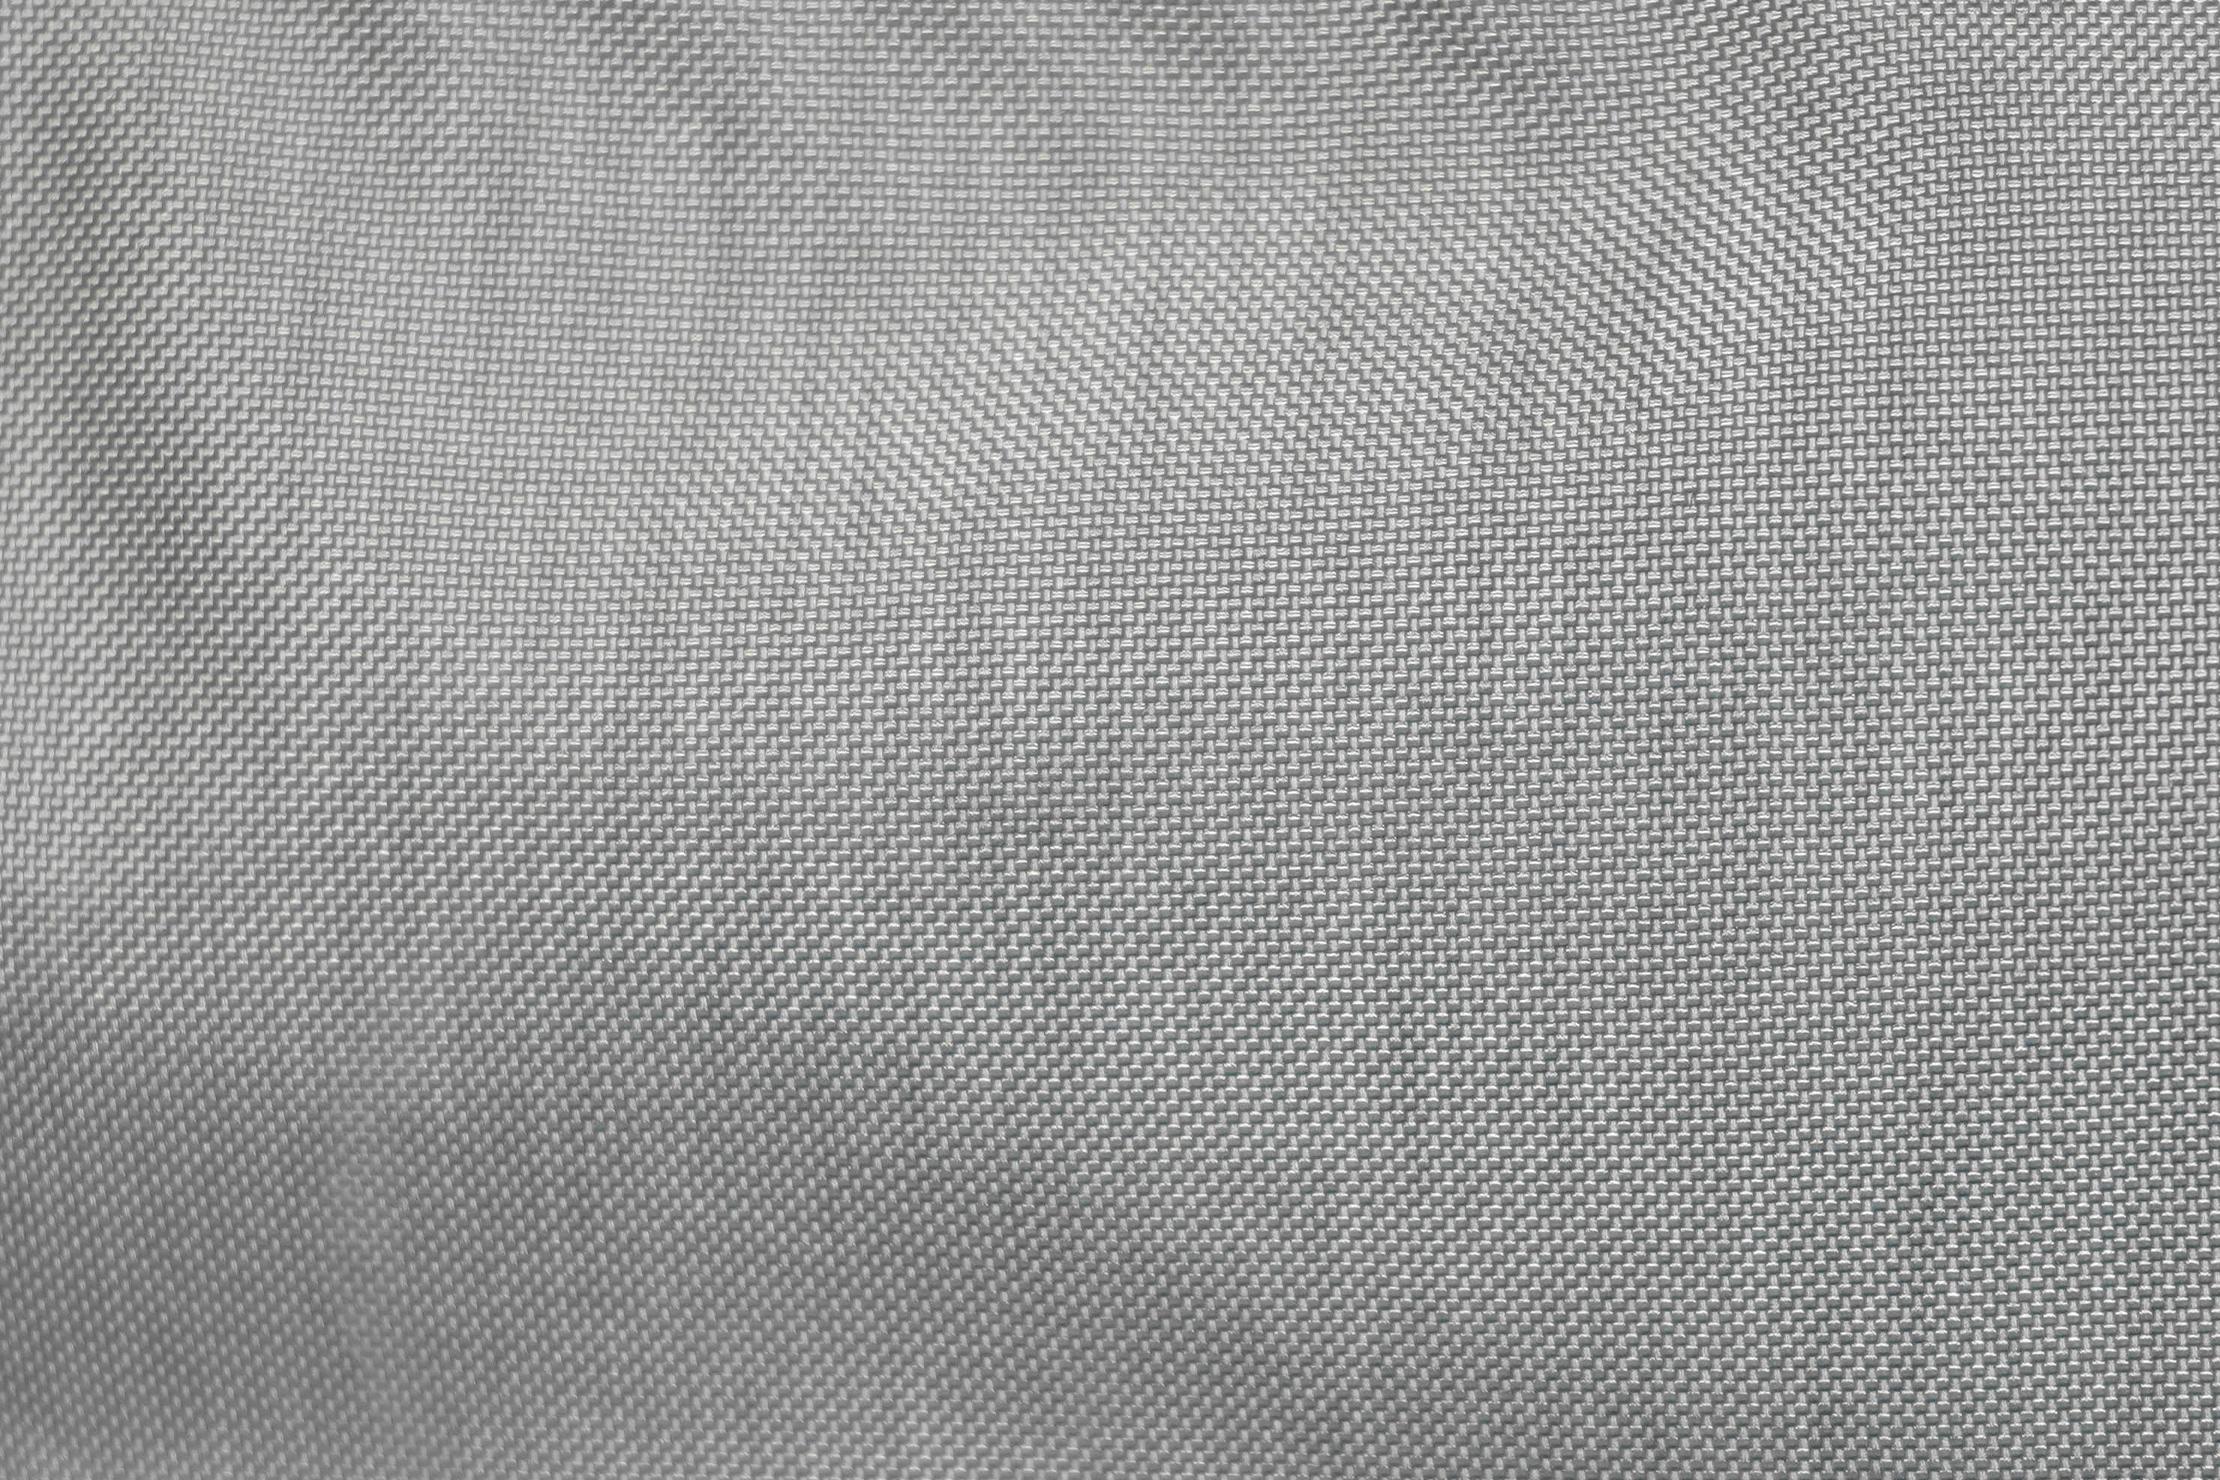 EVERGOODS Civic Half Zip 22 Internal Material